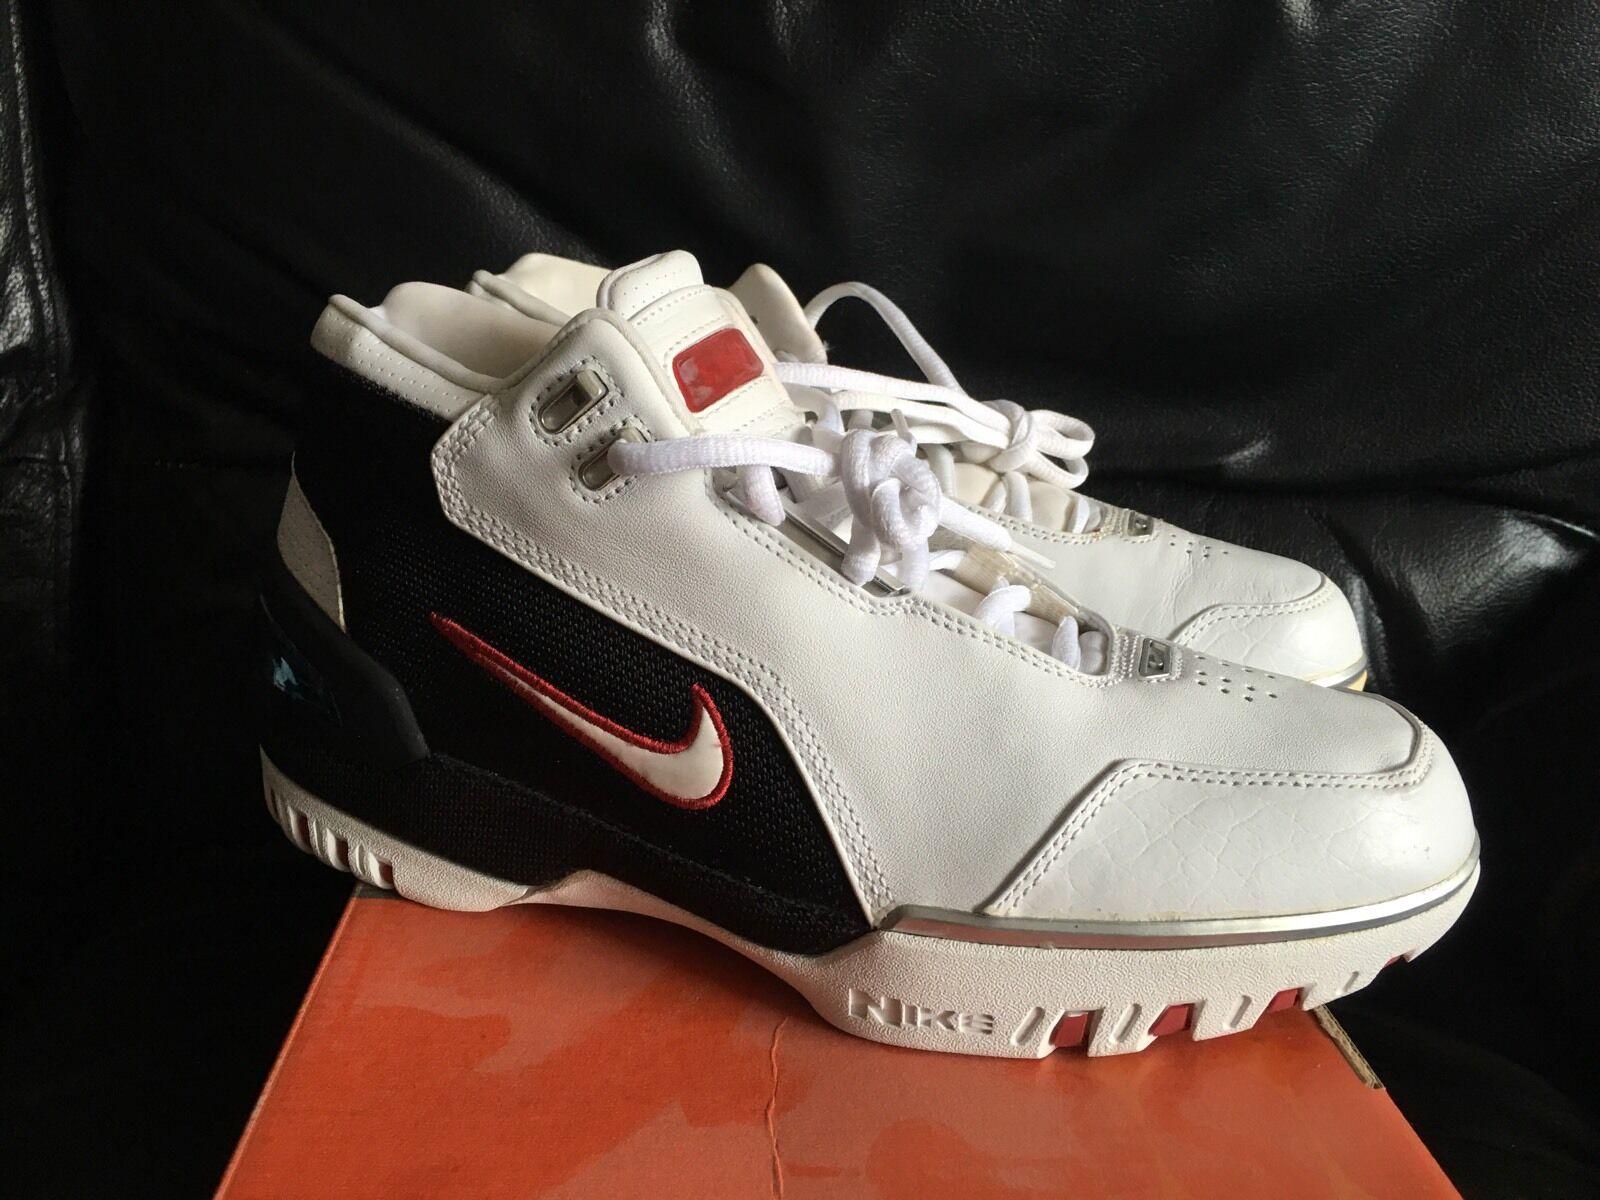 2004 Nike Air Zoom Generation Lebron James 1 size 8.5 w  box white crimson red